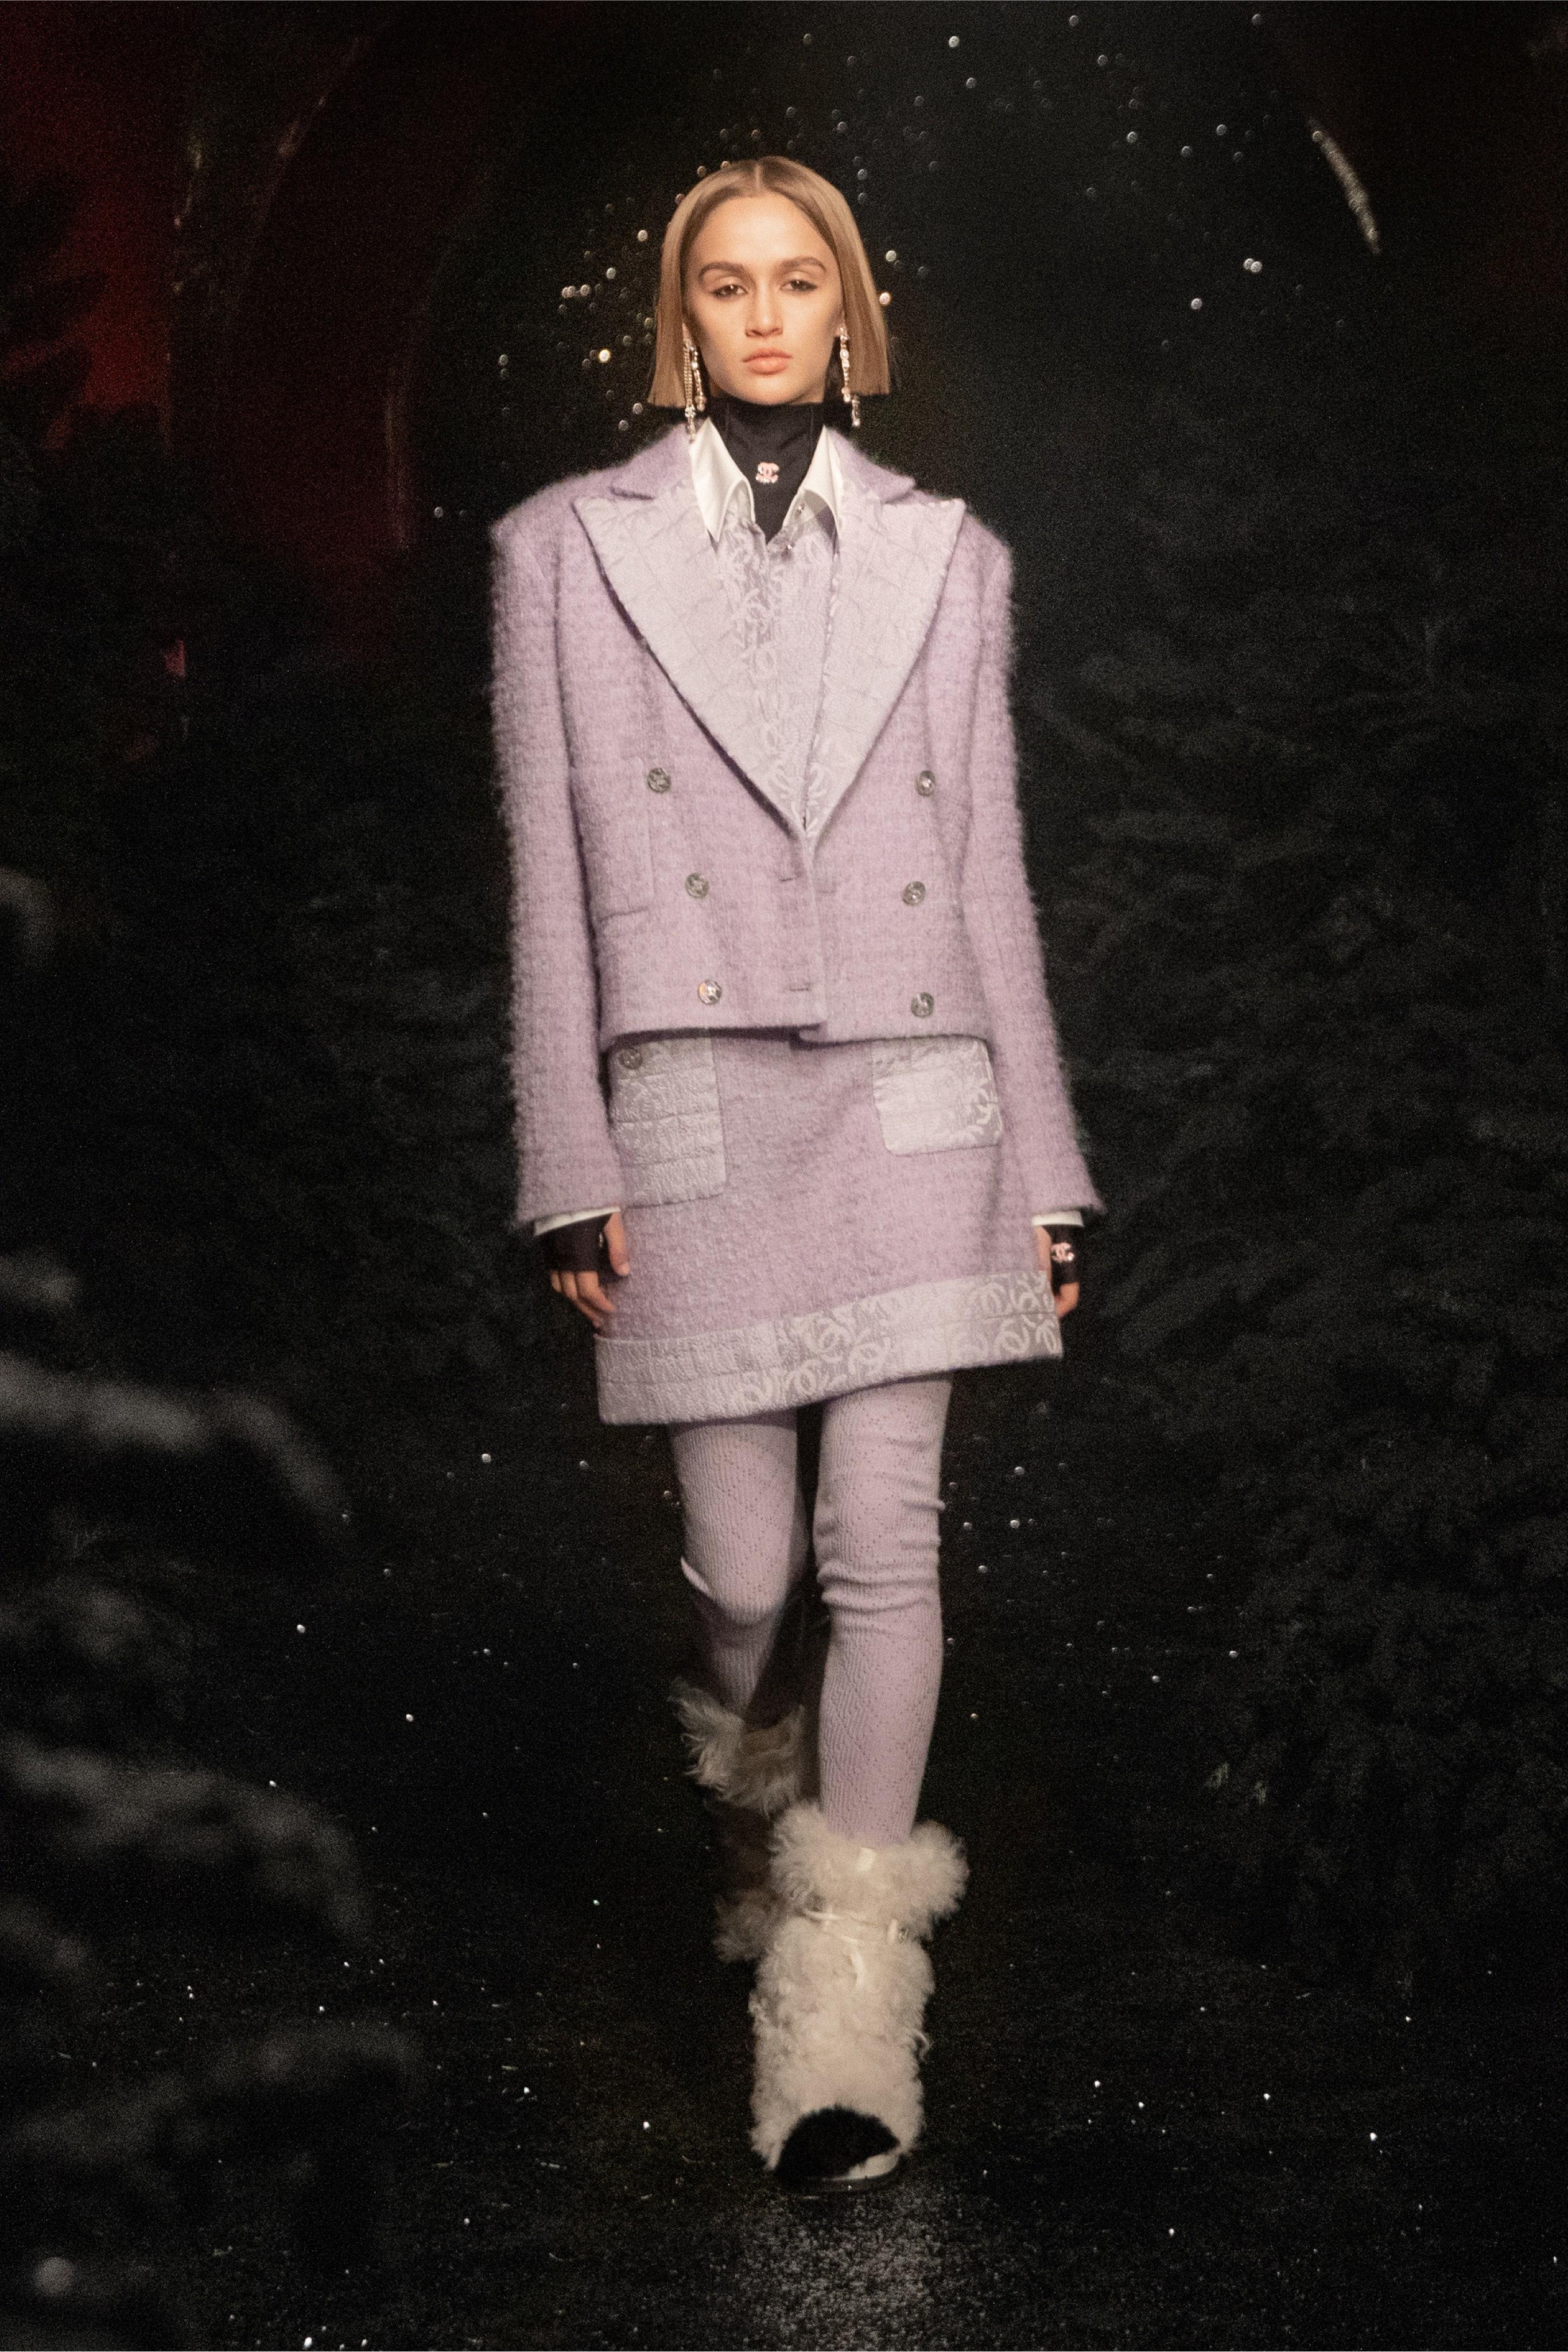 Chanel Fall Winter 2021